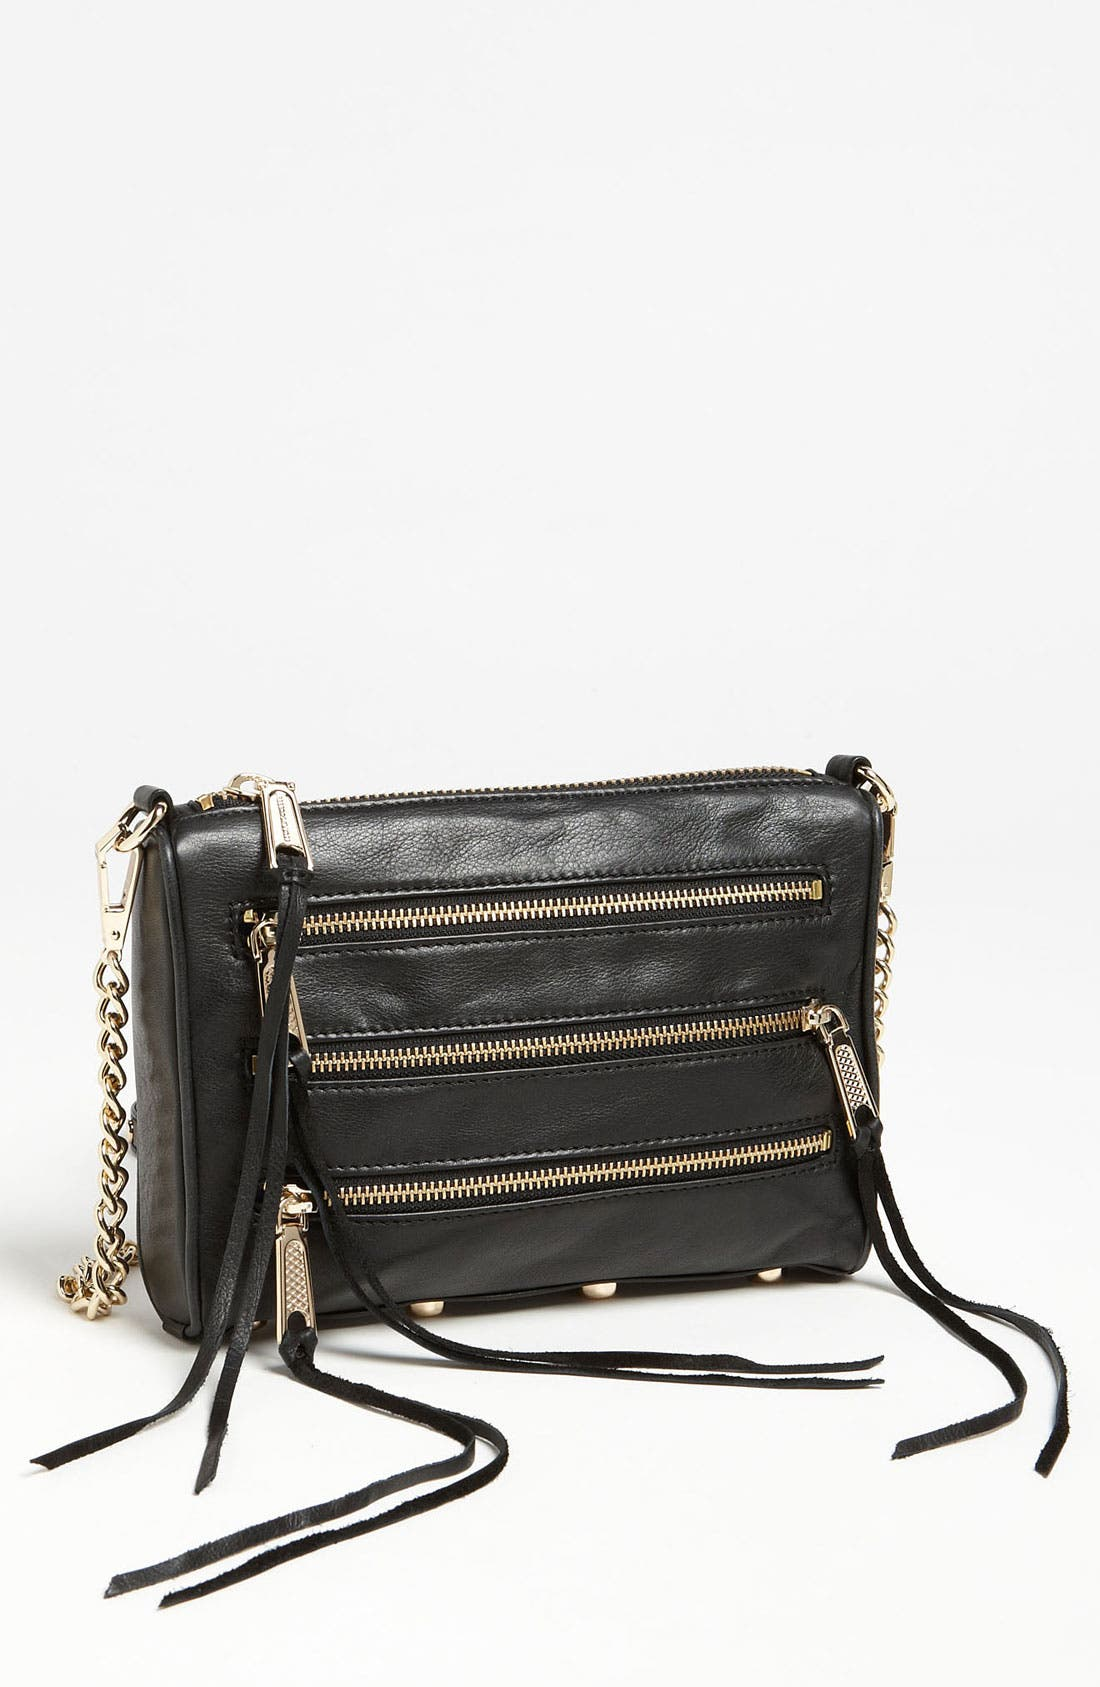 REBECCA MINKOFF 'Mini 5 Zip' Convertible Crossbody Bag, Main, color, 001